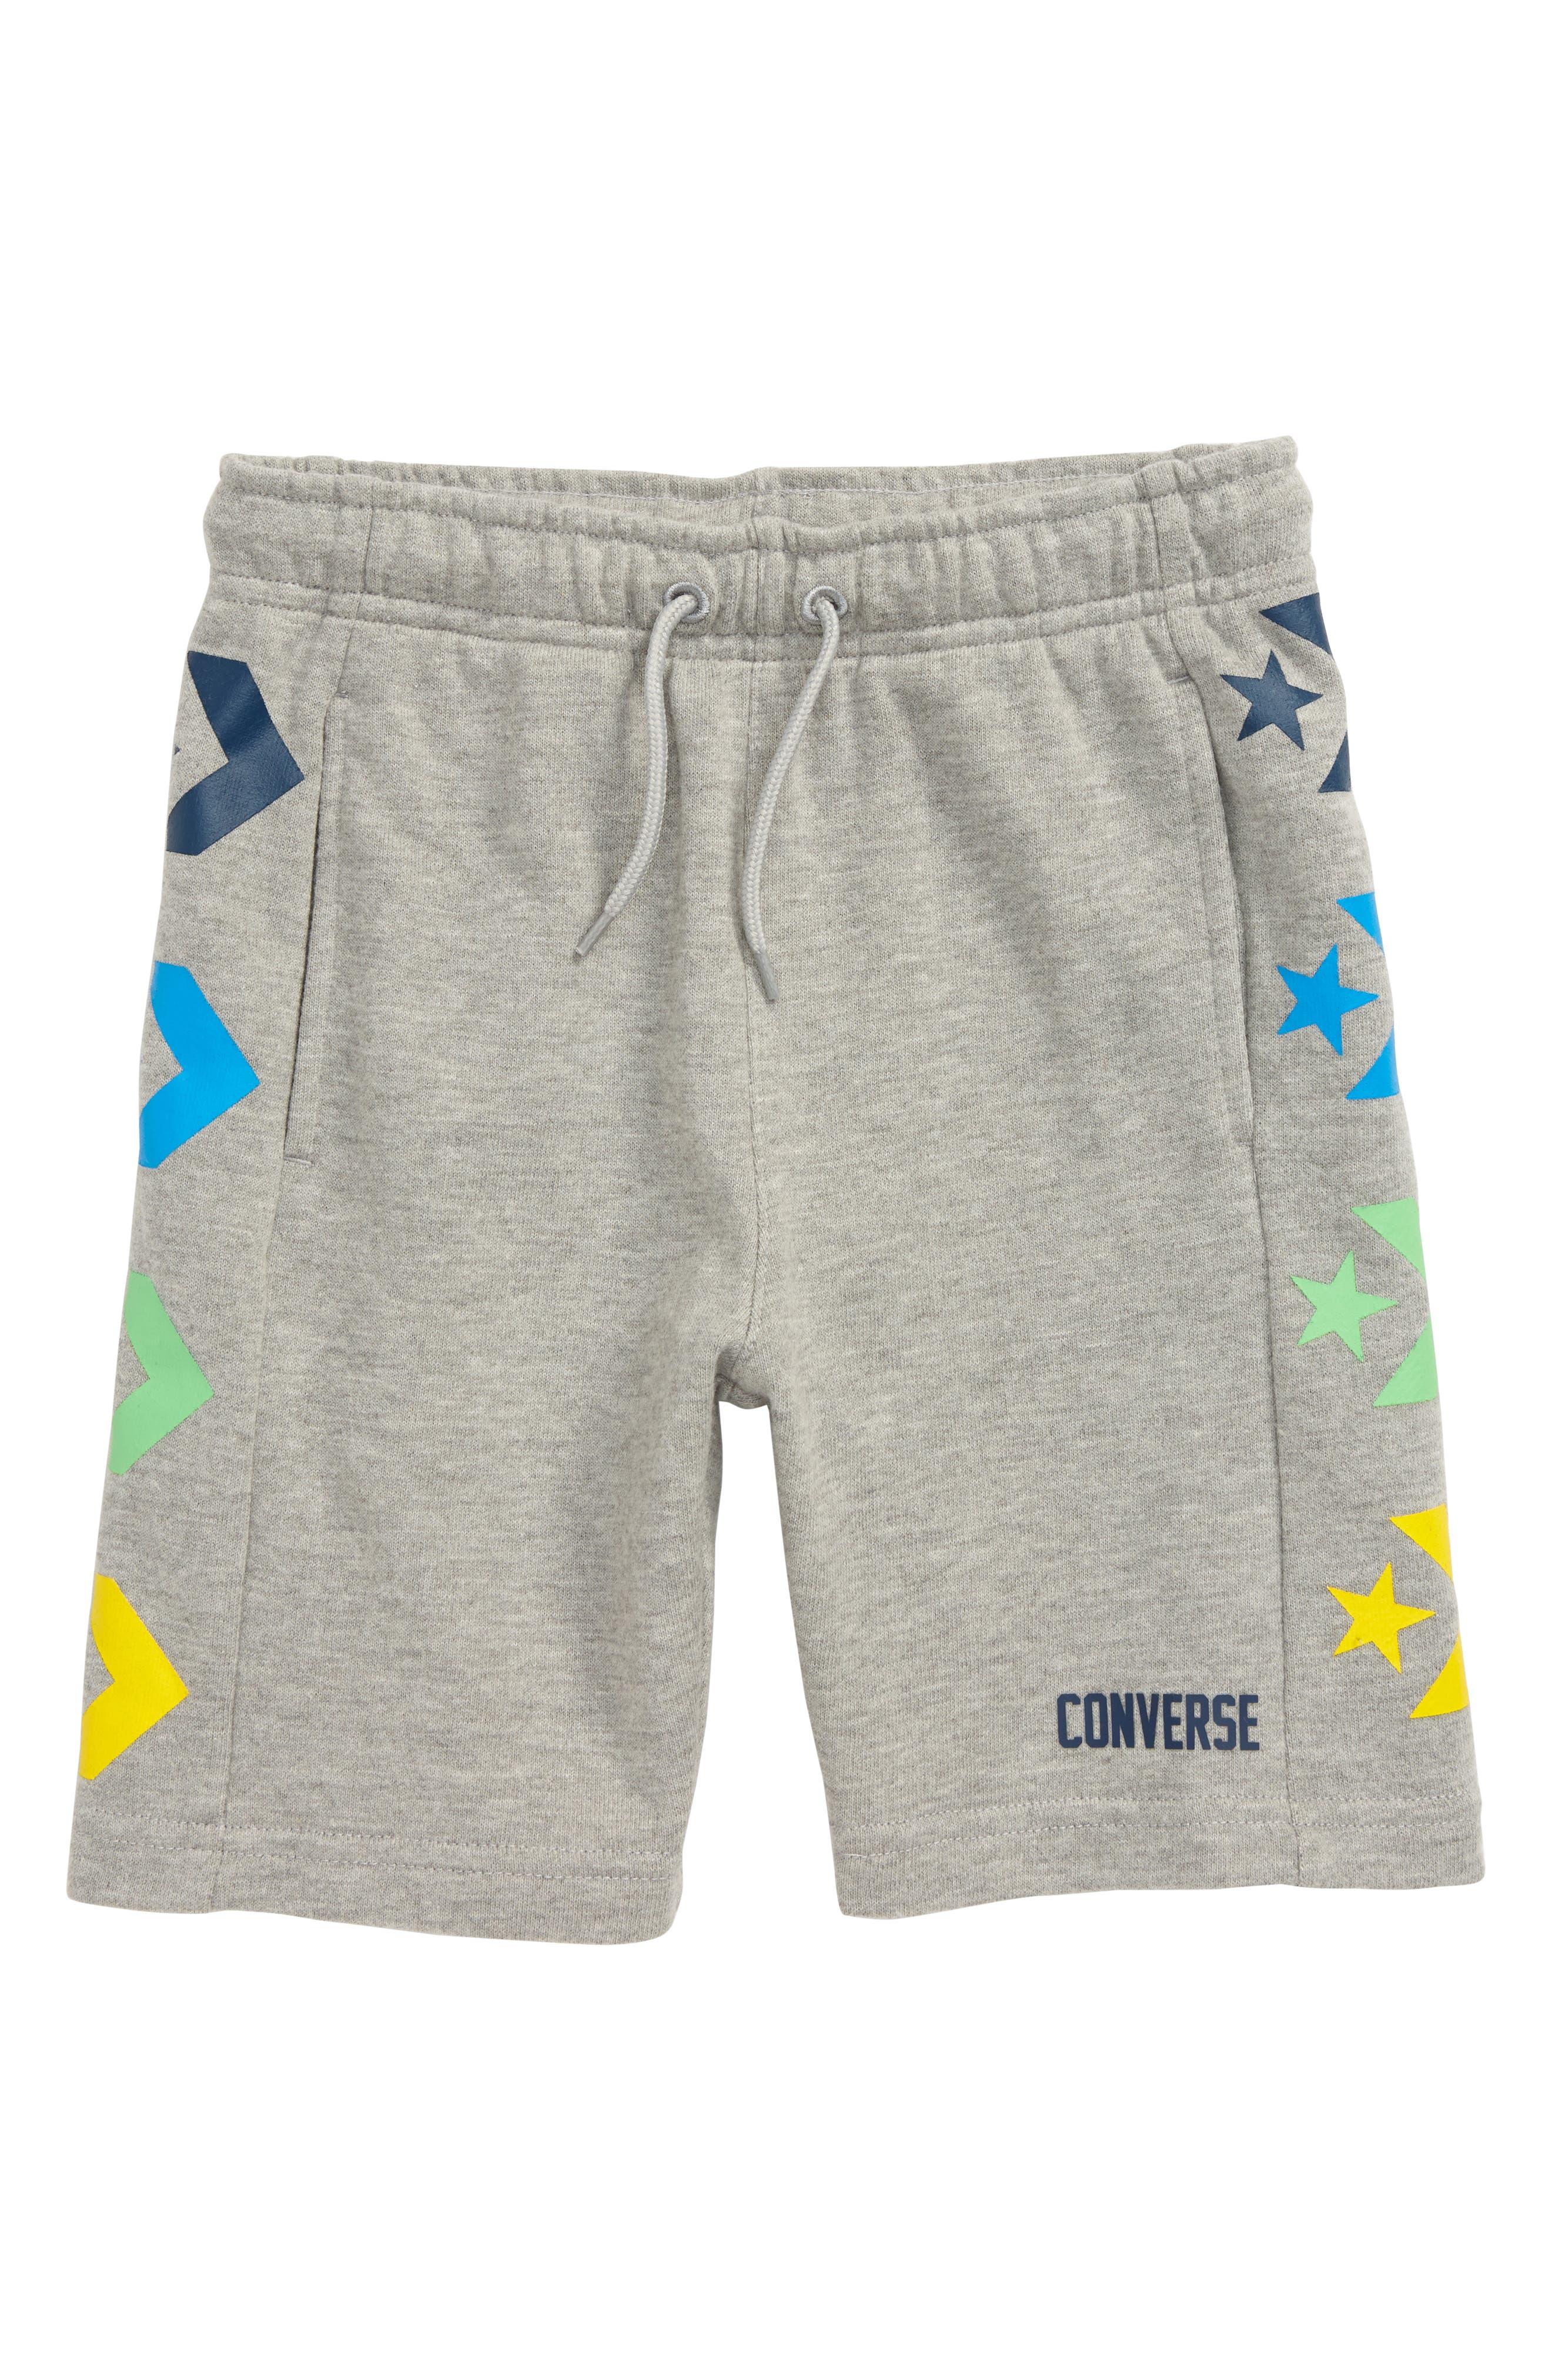 Boys Converse Star Chevron Print Knit Athletic Shorts Size S (810y)  Grey